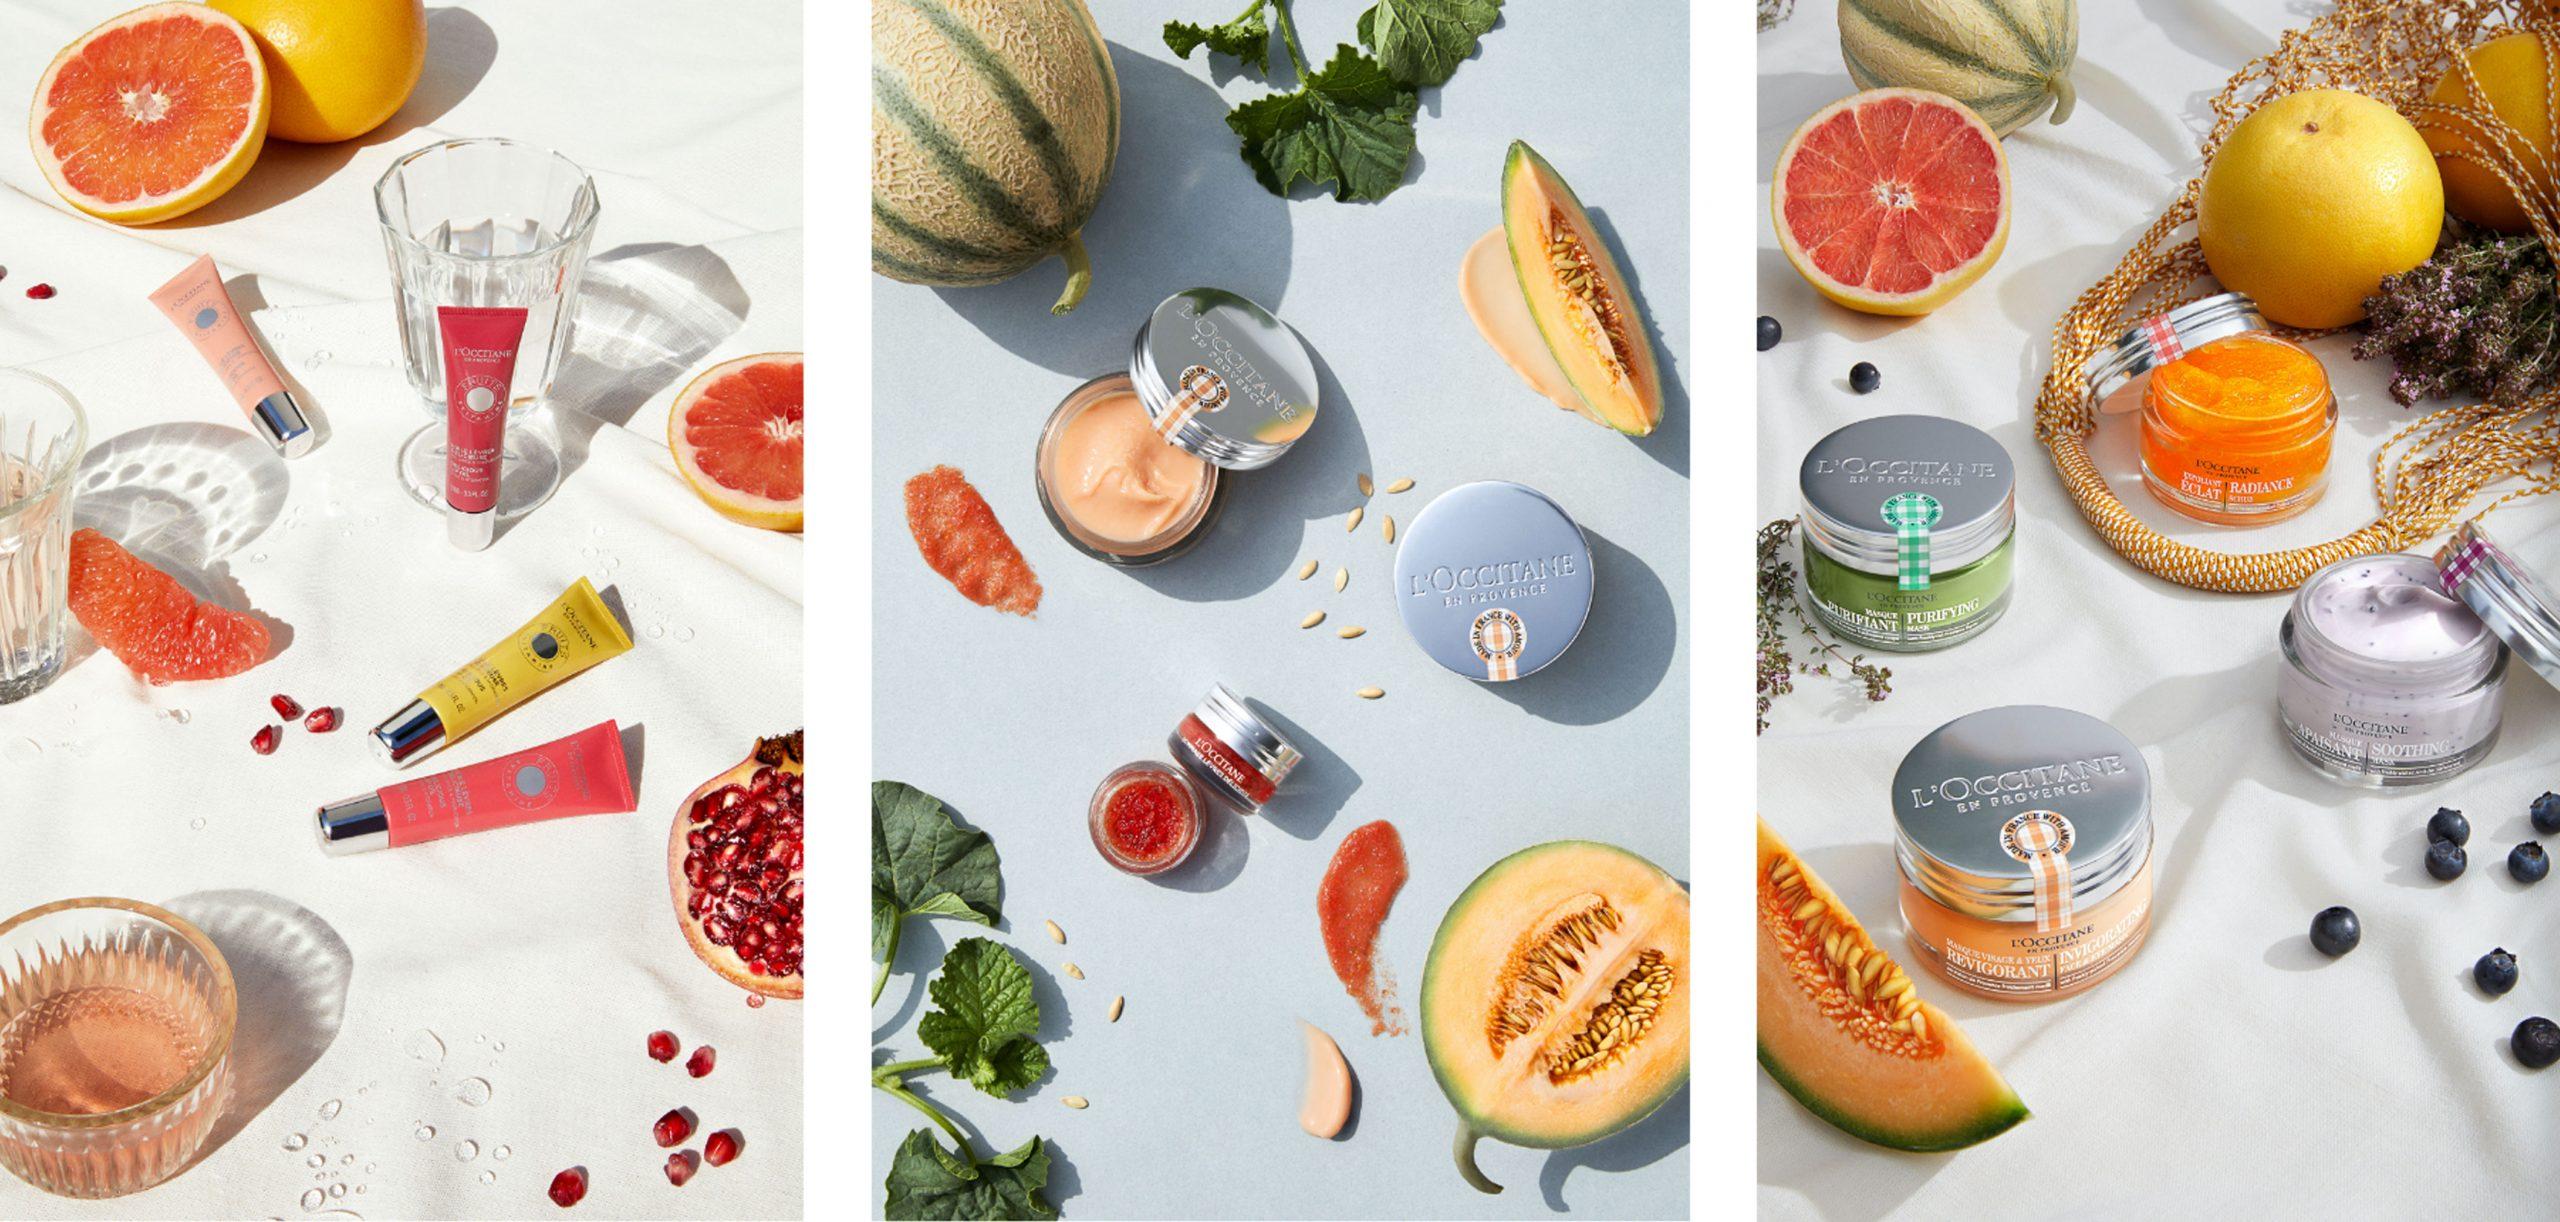 L'Occitane reveal your colors fruits